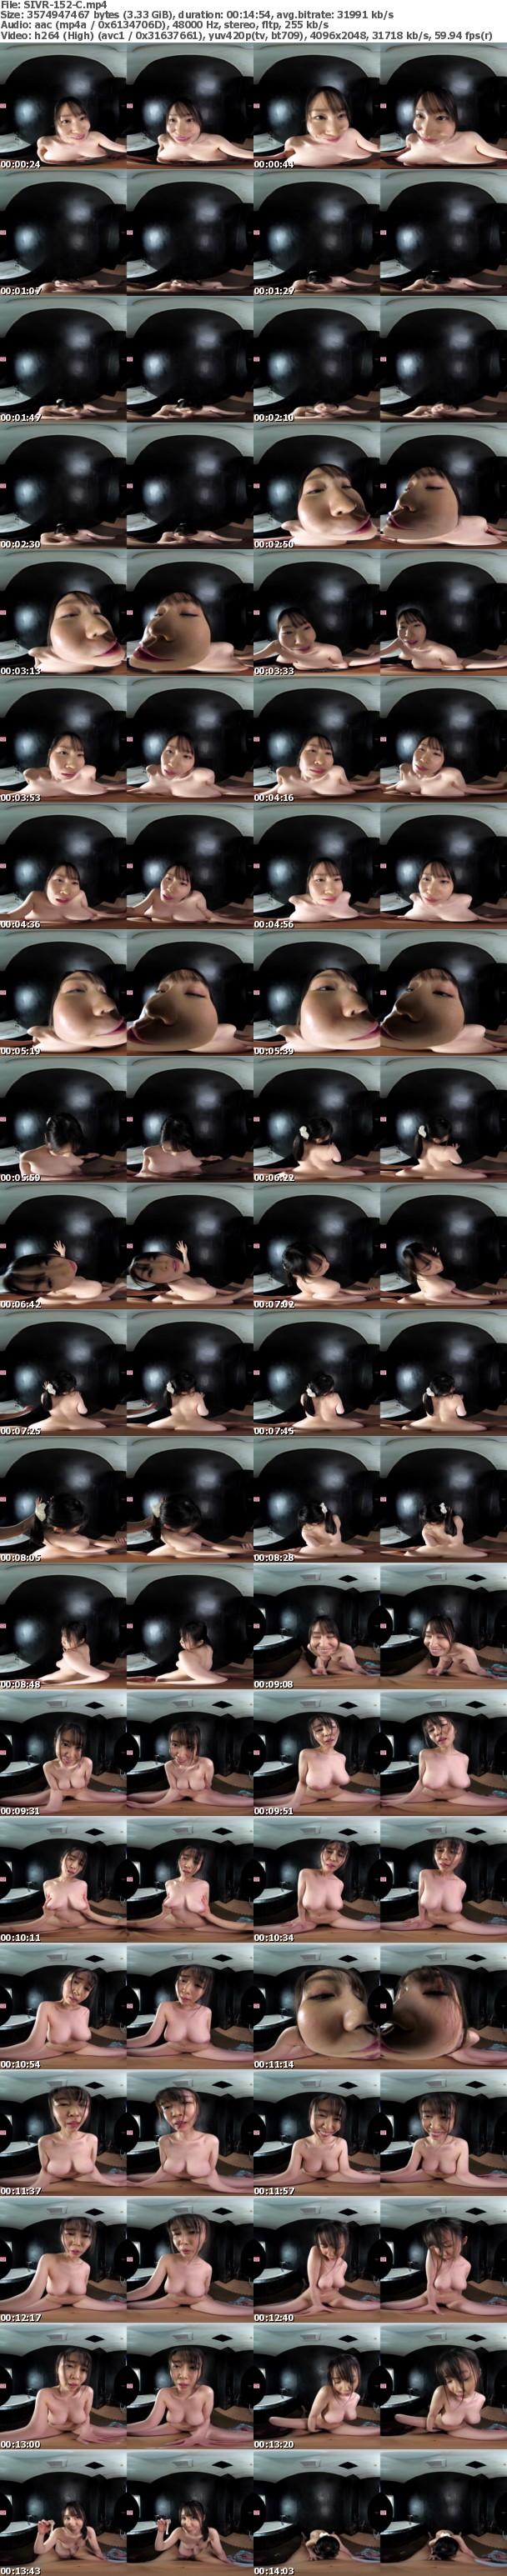 (VR) SIVR-152 【壁ドン合体VR】迫る神乳!えっろい囁き声!友人や同僚に隠れて隅っこで大胆不敵セックス 夢乃あいか